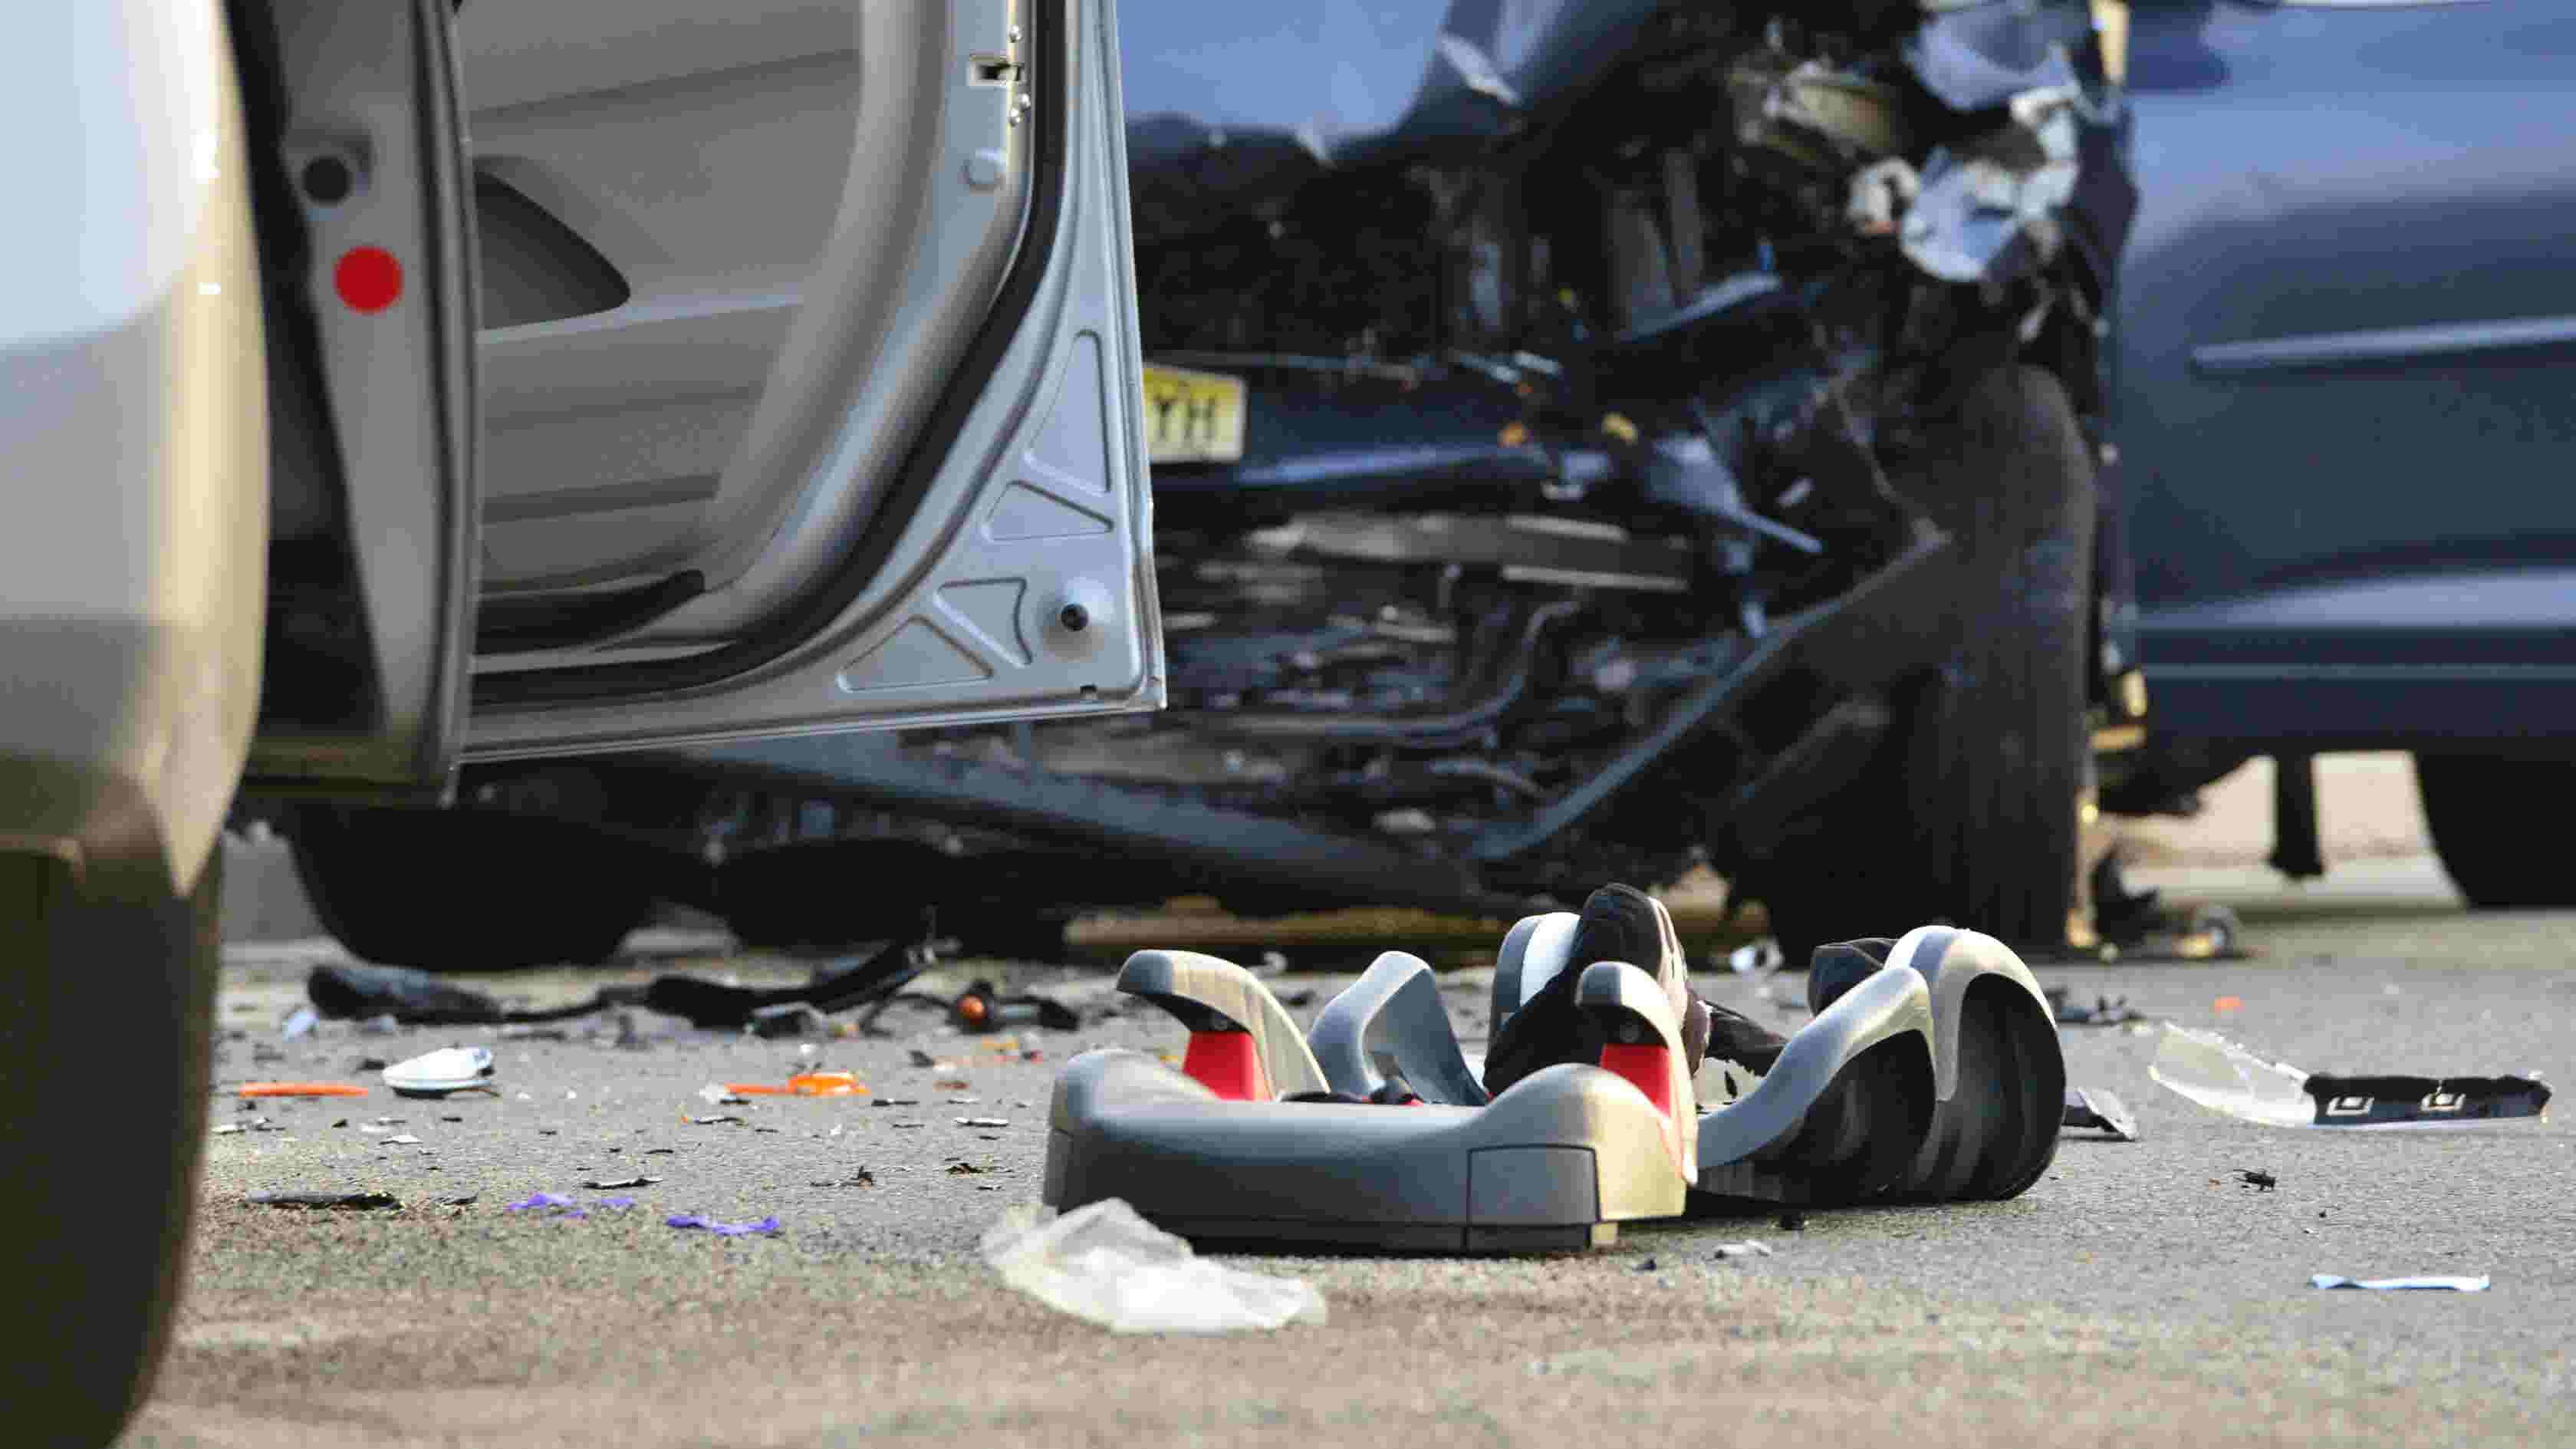 harrington park nj car crash: 2 people in critical condition